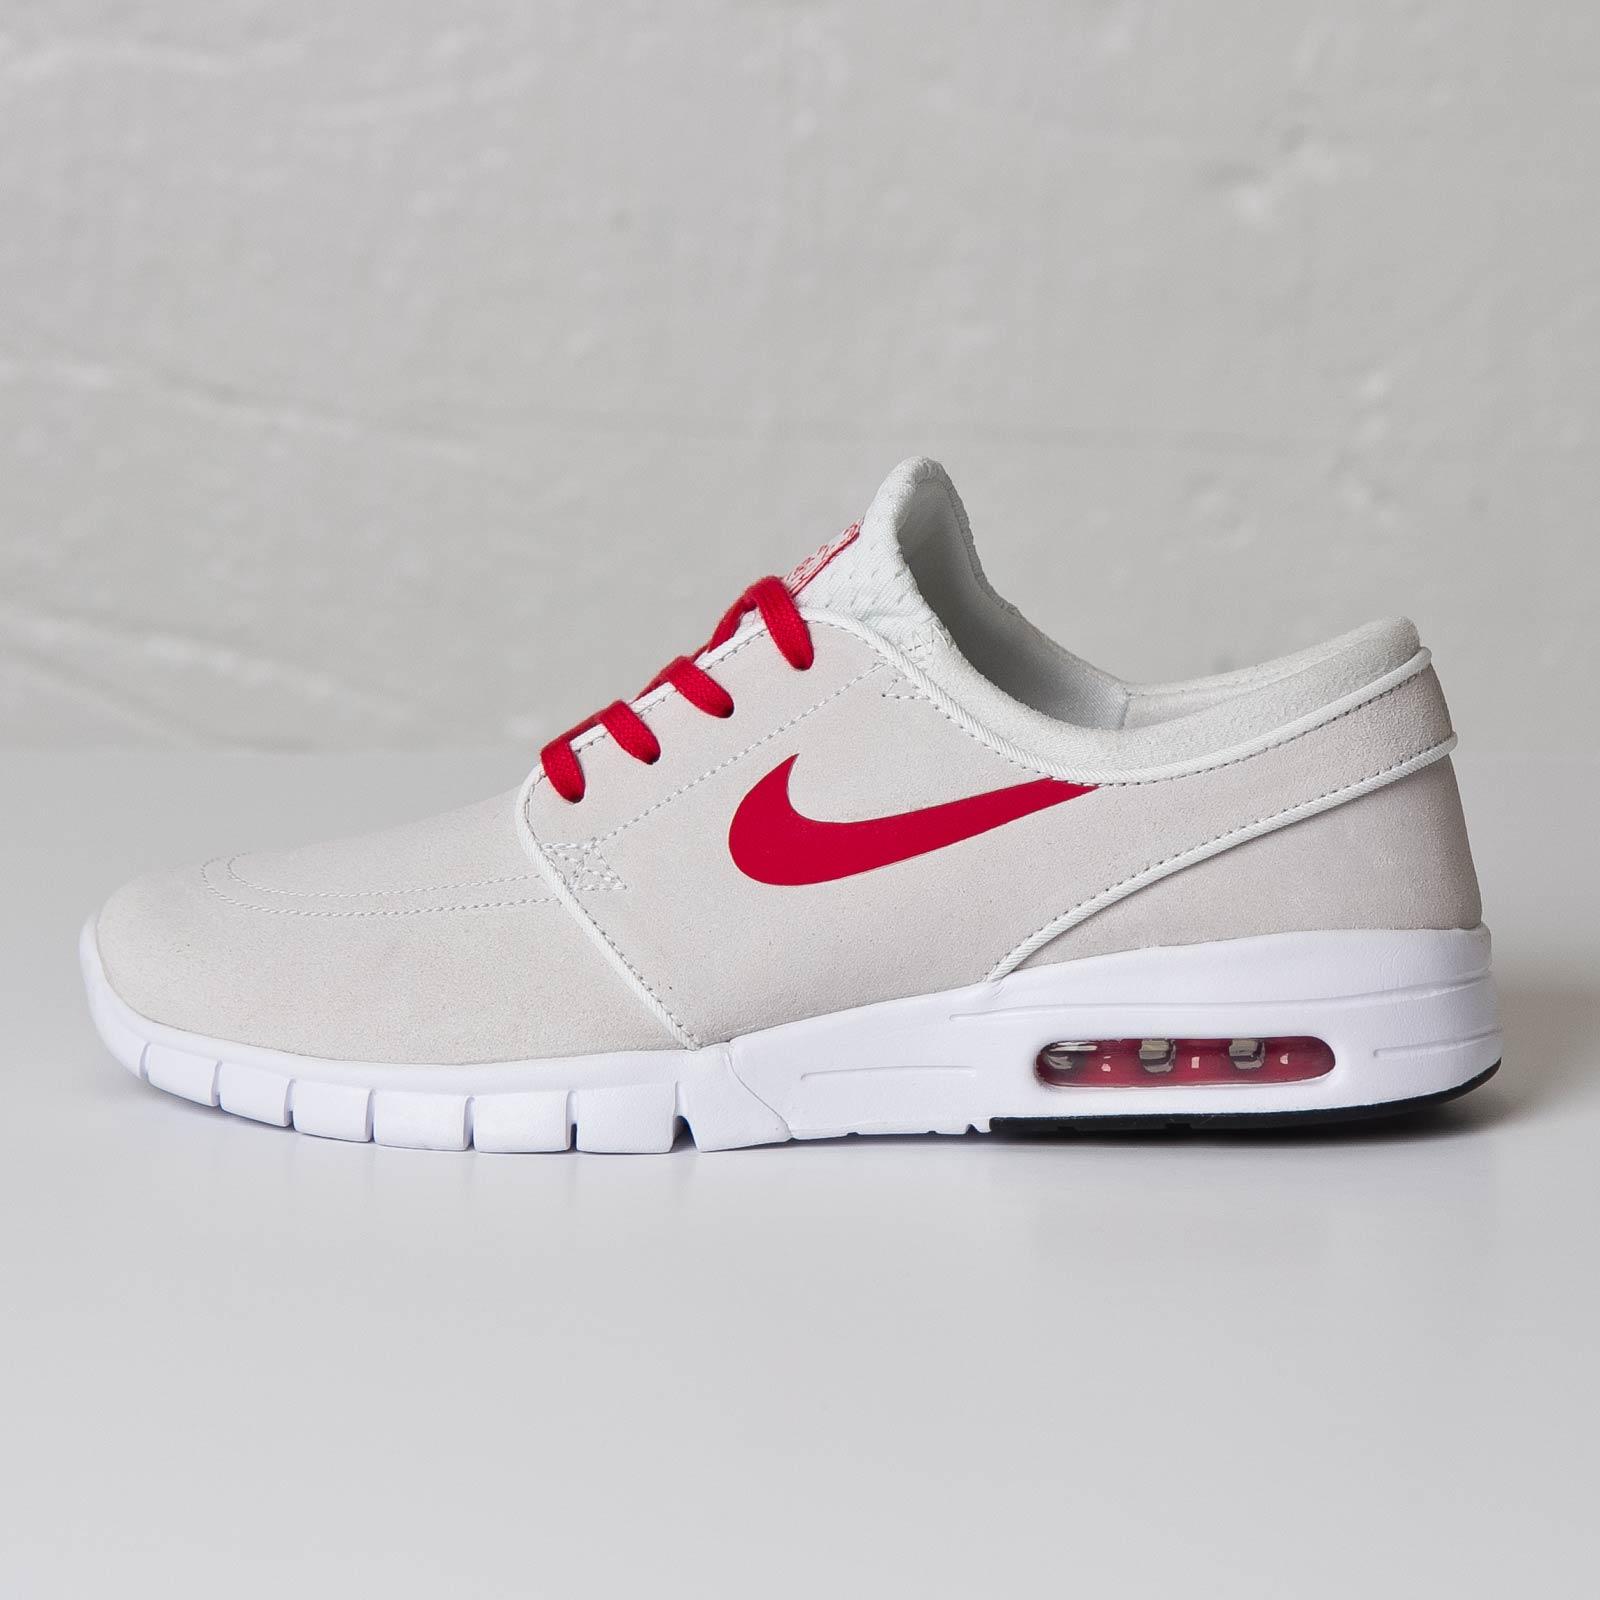 separation shoes 69802 d7f3a Nike Stefan Janoski Max L - 6. Close